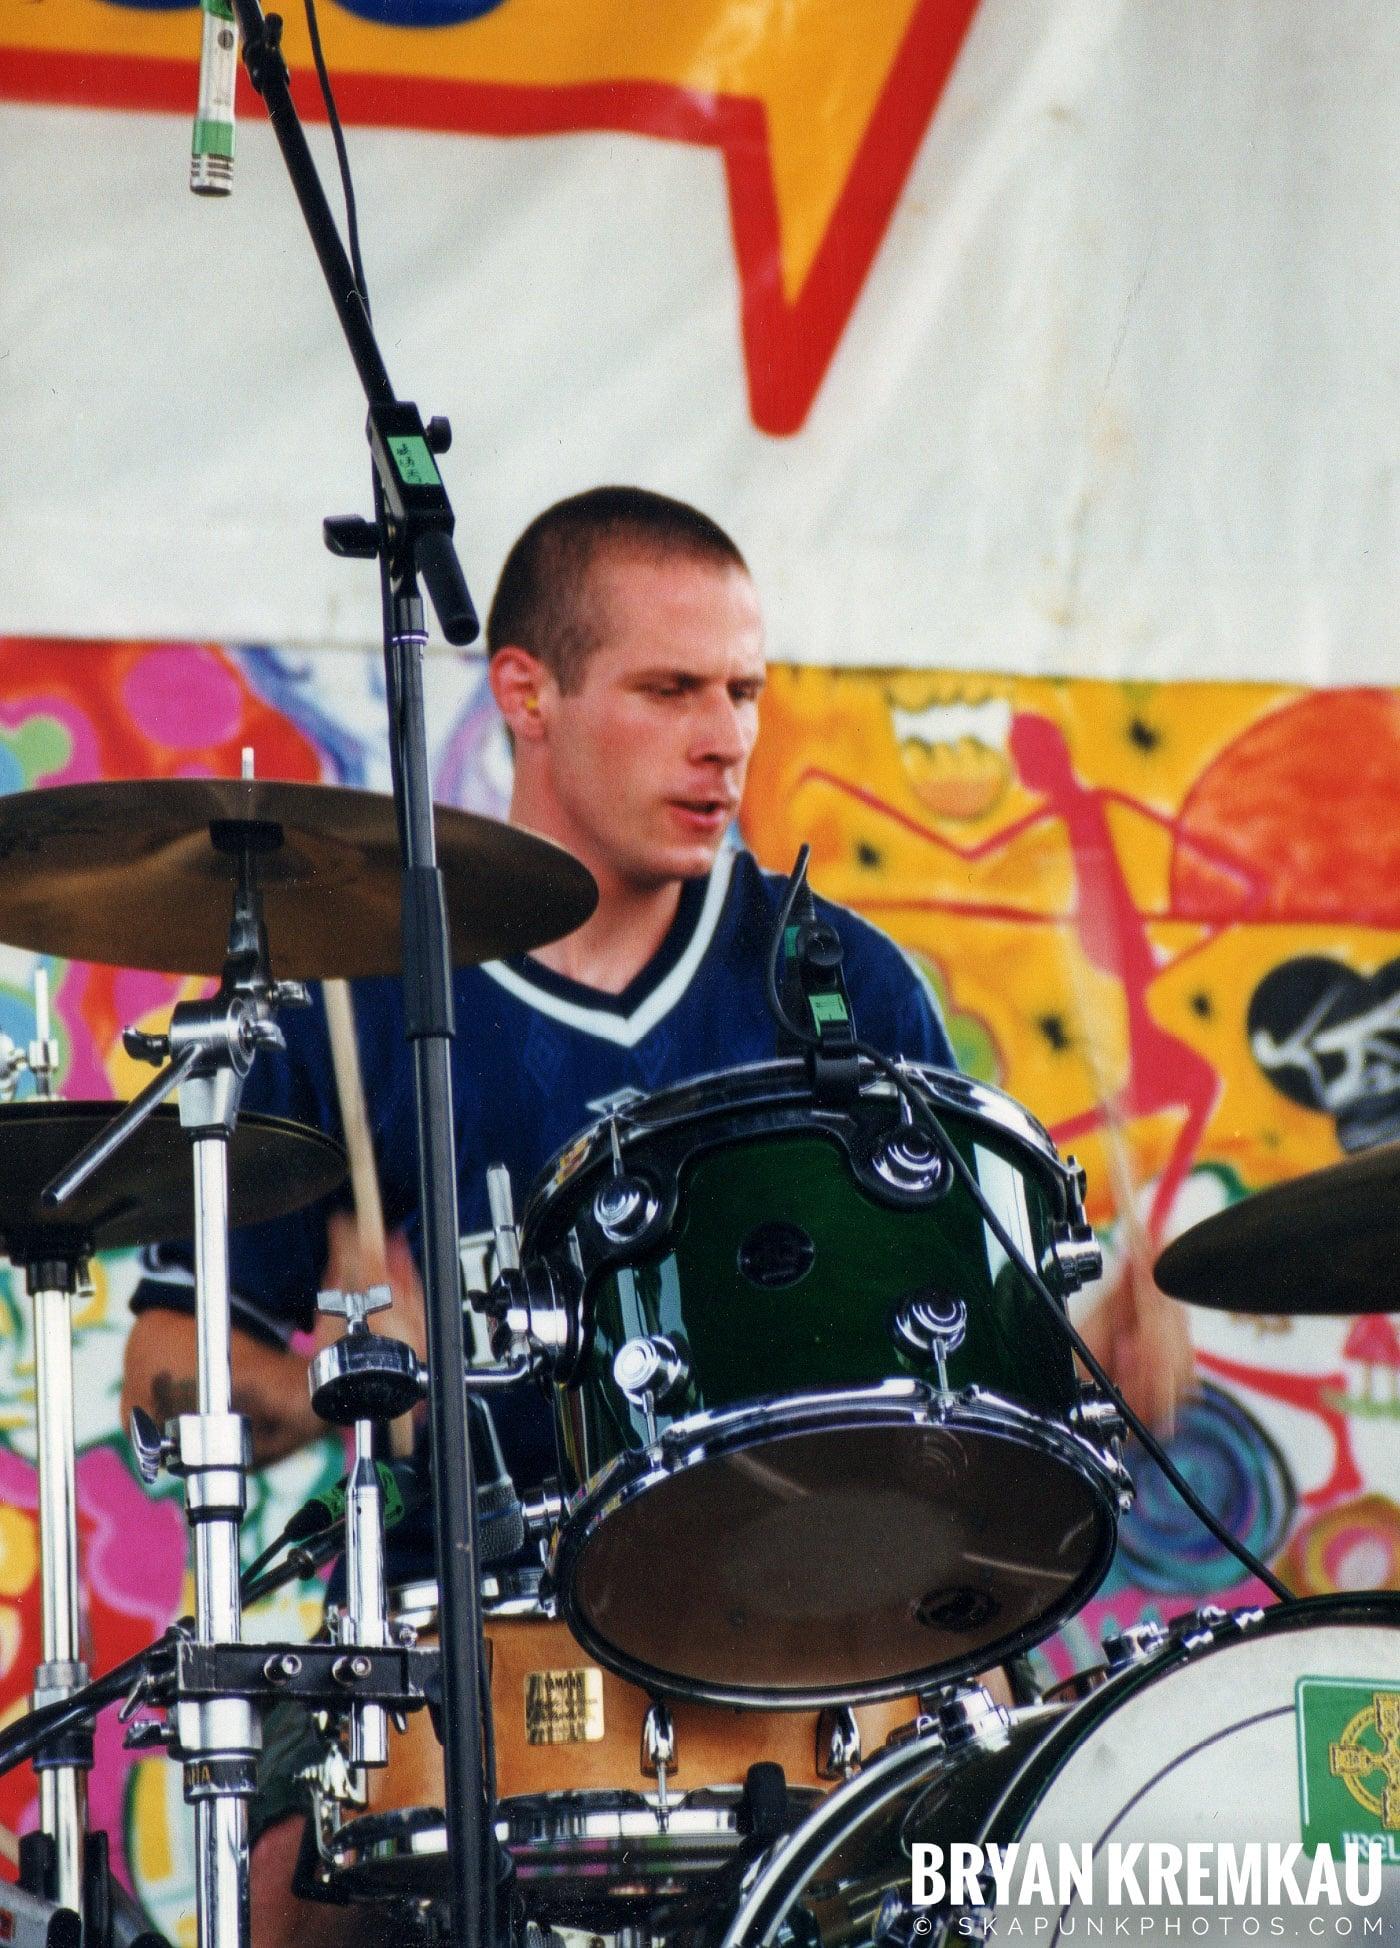 The Dropkick Murphys @ Vans Warped Tour, Randall's Island, NYC - 7.16.99 (6)